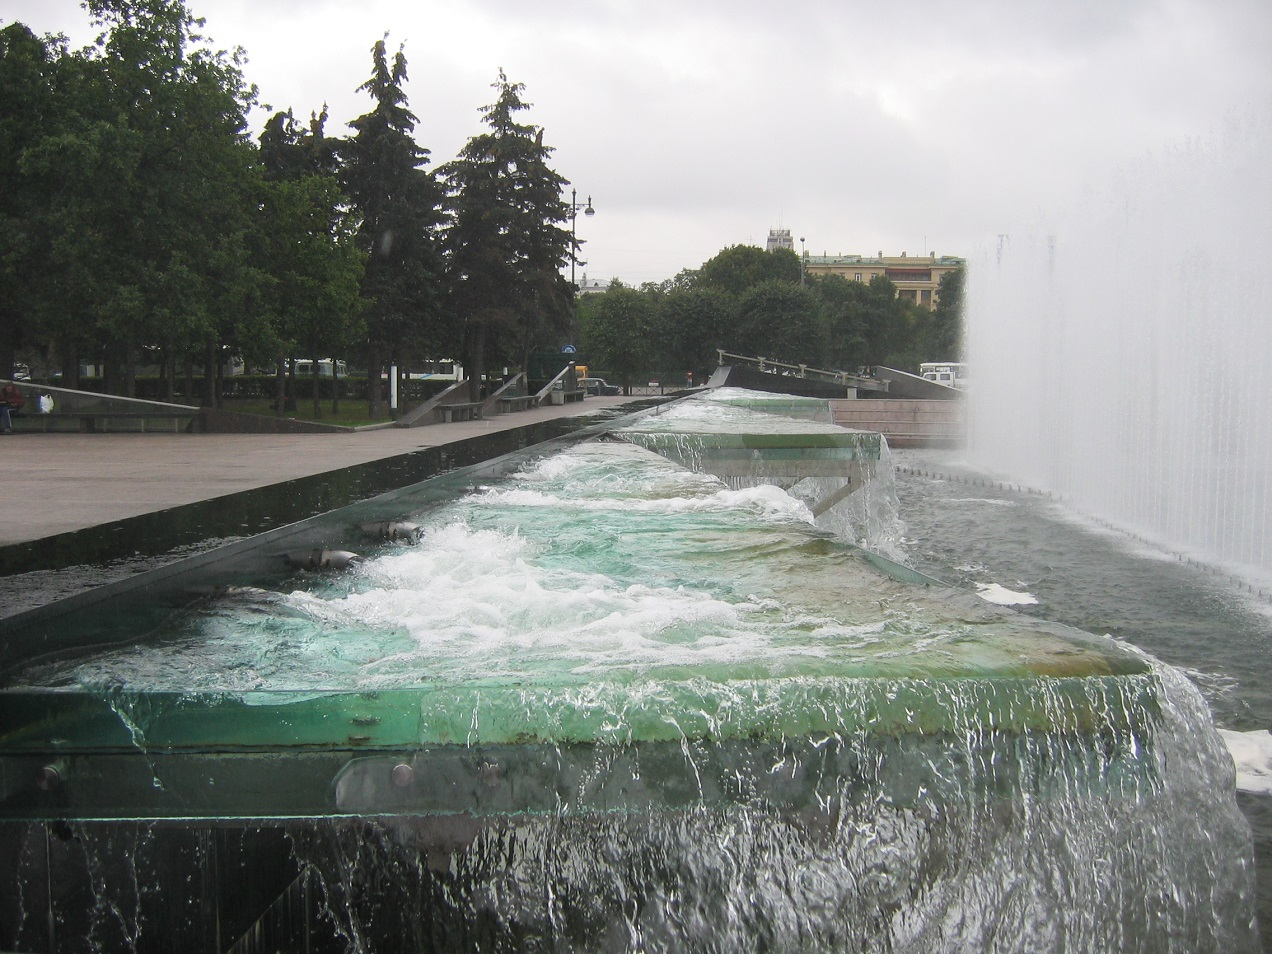 Устройство одного из фонтанов. Автор: Yanachka, Wikimedia Commons